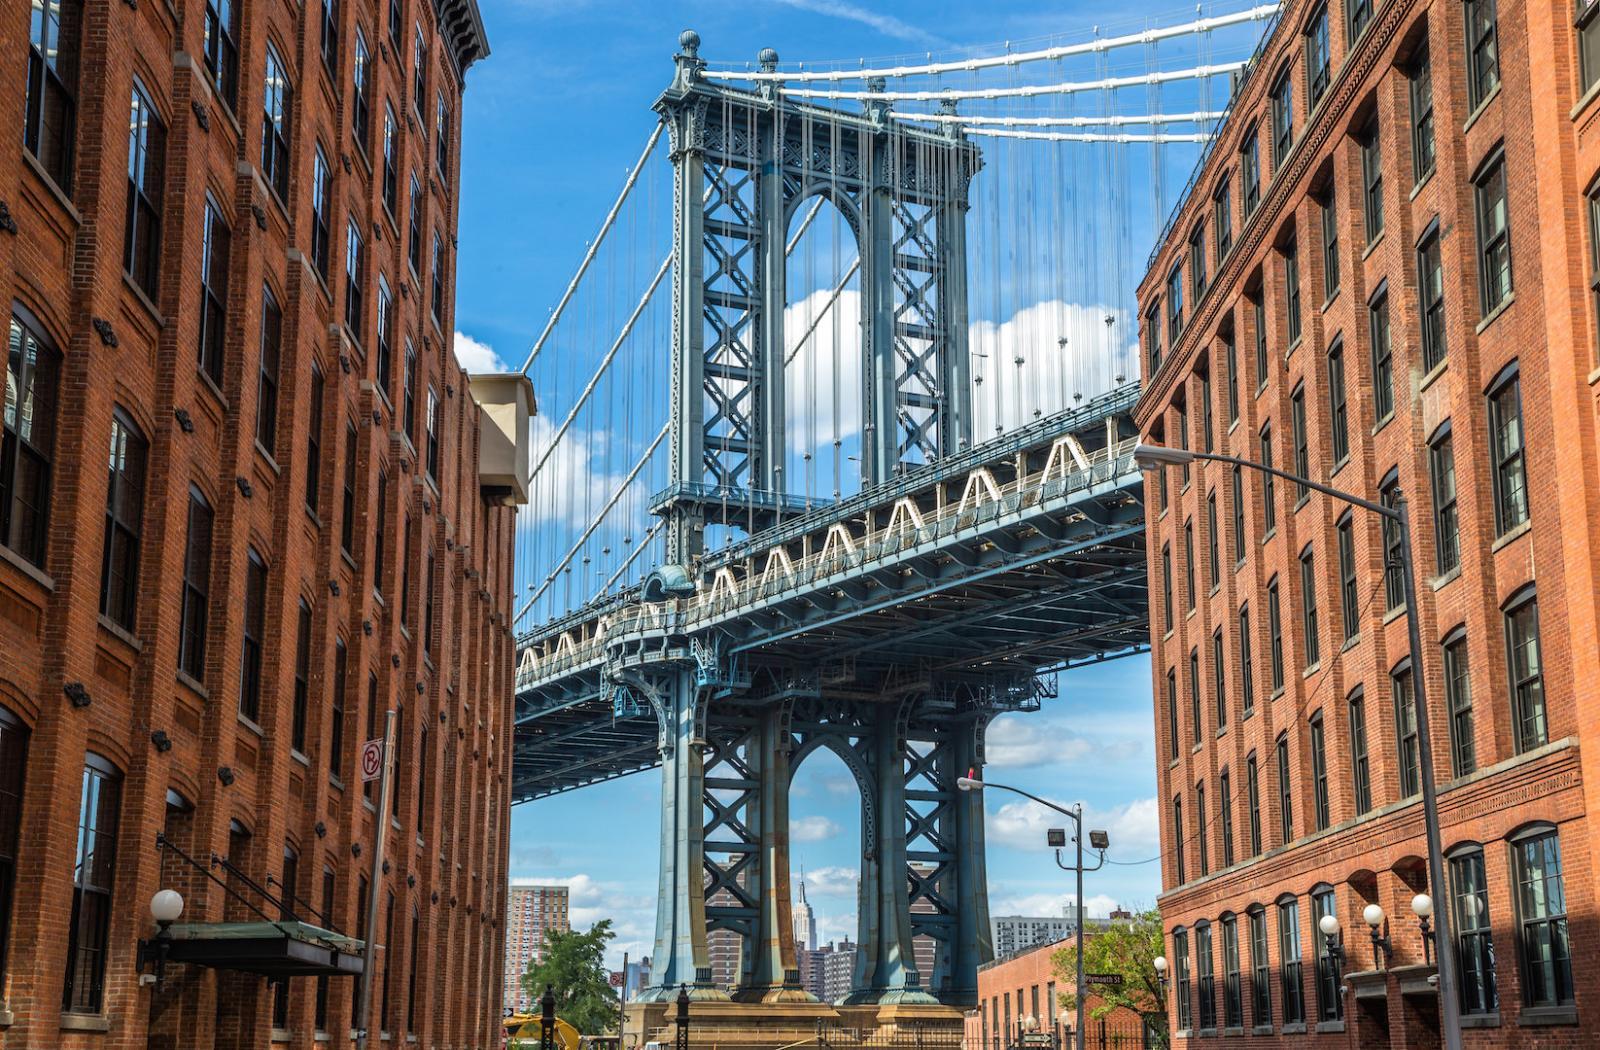 New York City Brooklyn, Dumbo